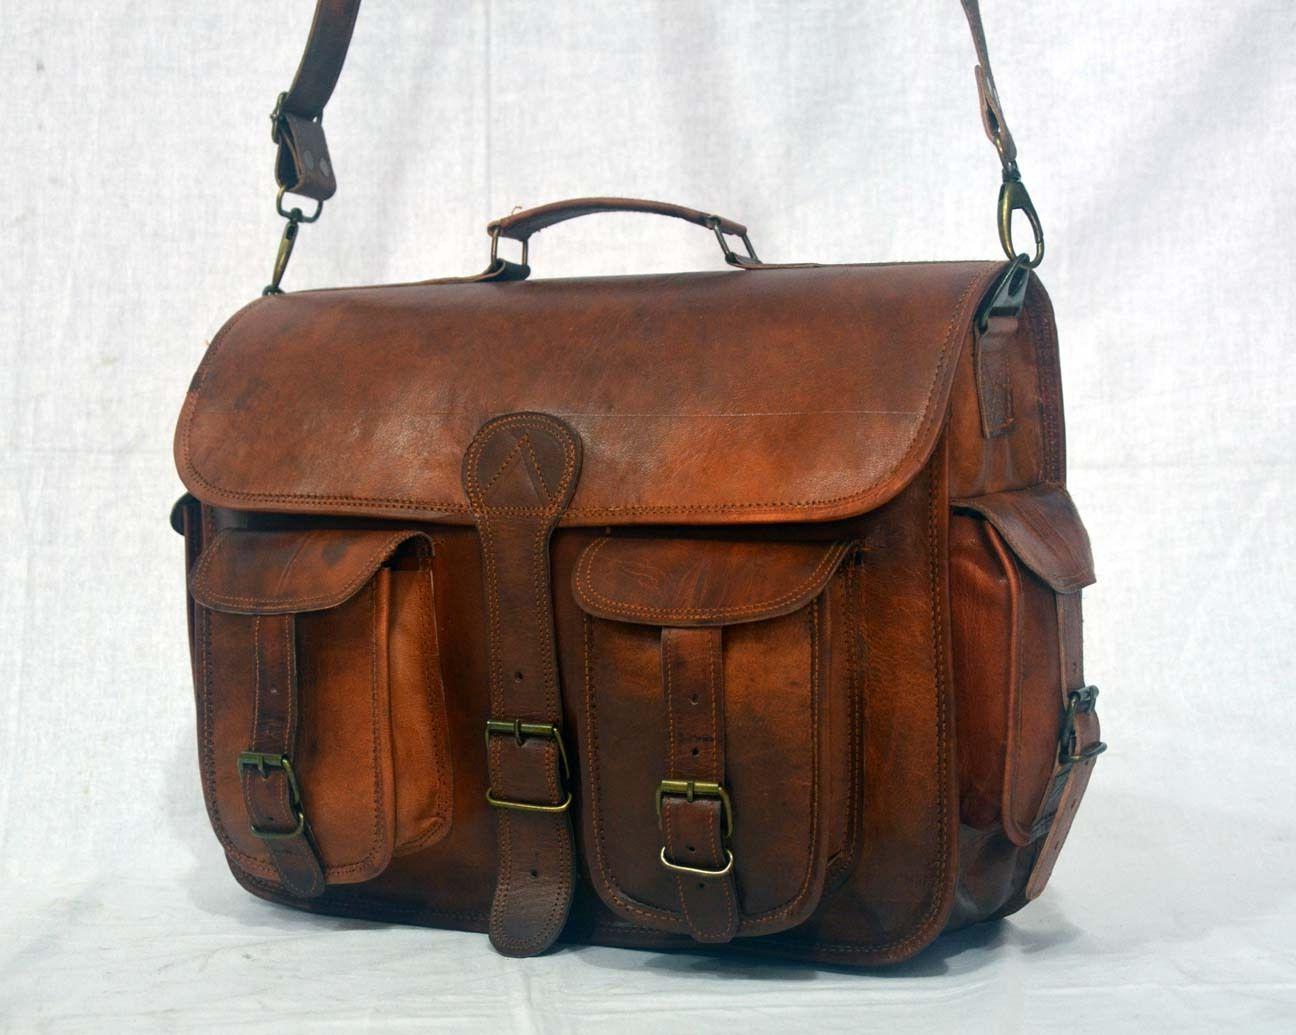 leather satchel bag calvin klein satchel nike satchel